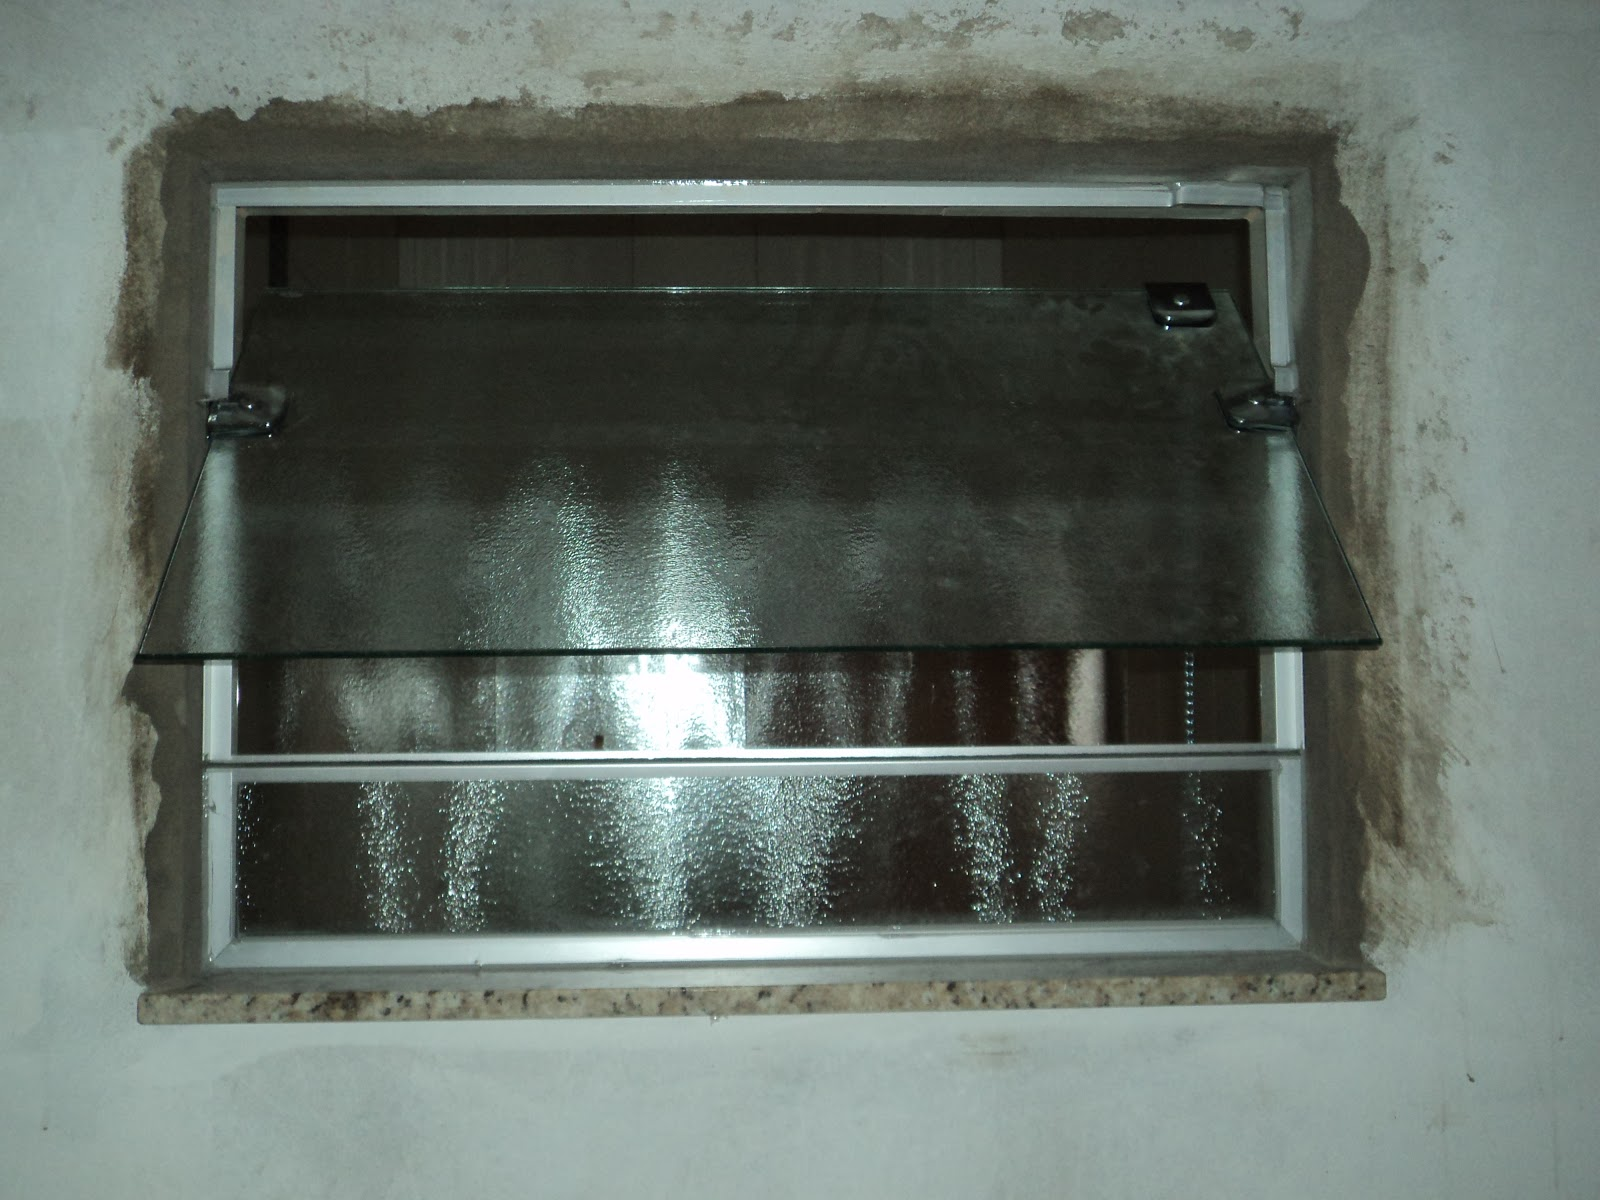 #527974 Box e Janela do Wc em vidro Antílope 08mm janela no sistema  184 Janelas De Vidro Na Potiguar